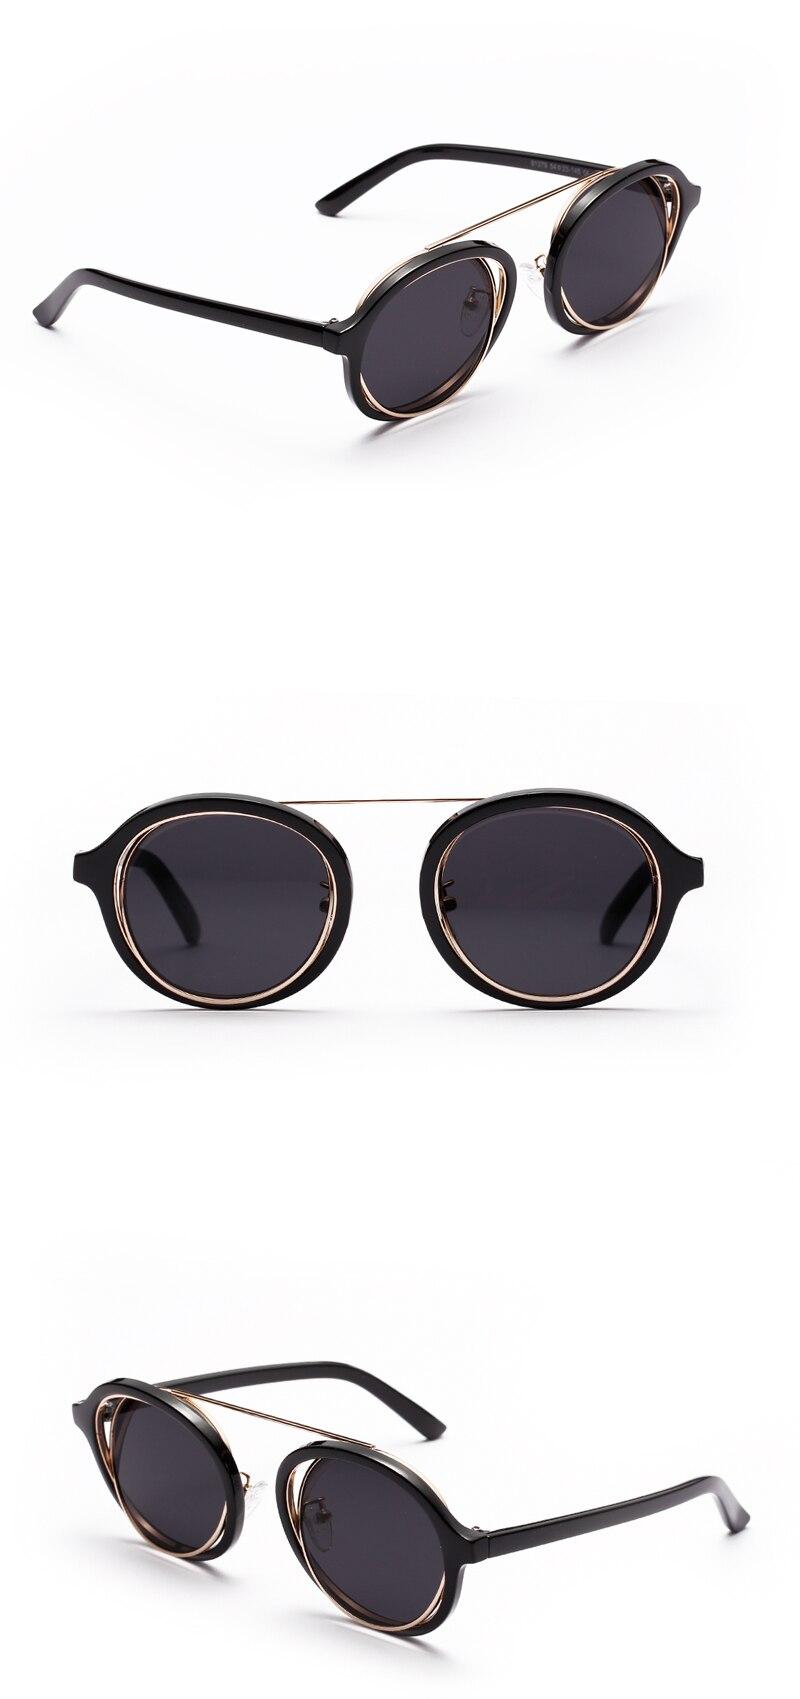 round sunglasses 2003 details (4)